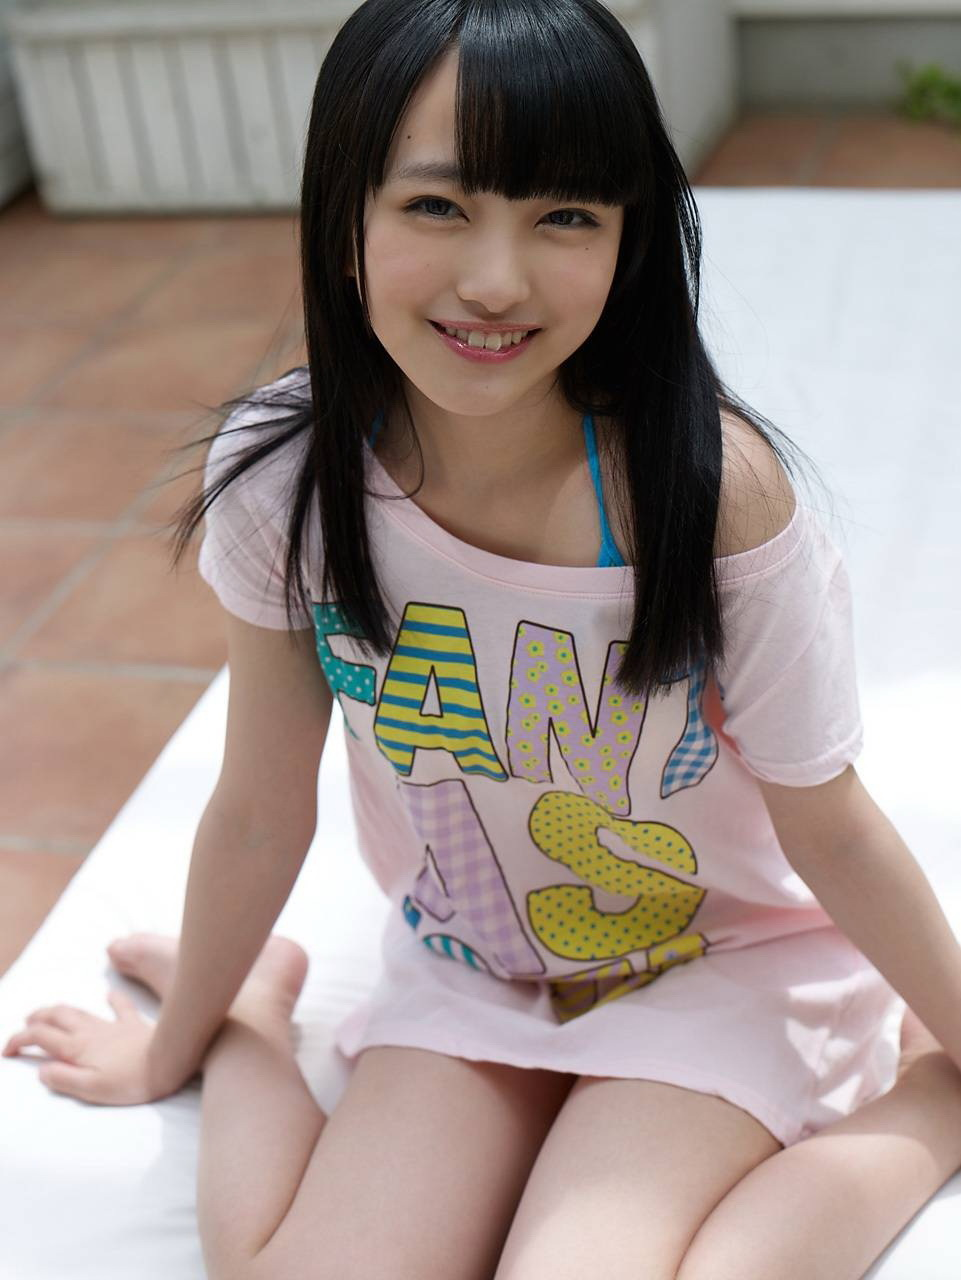 xxx-hot-happy-japanese-teen-simson-nude